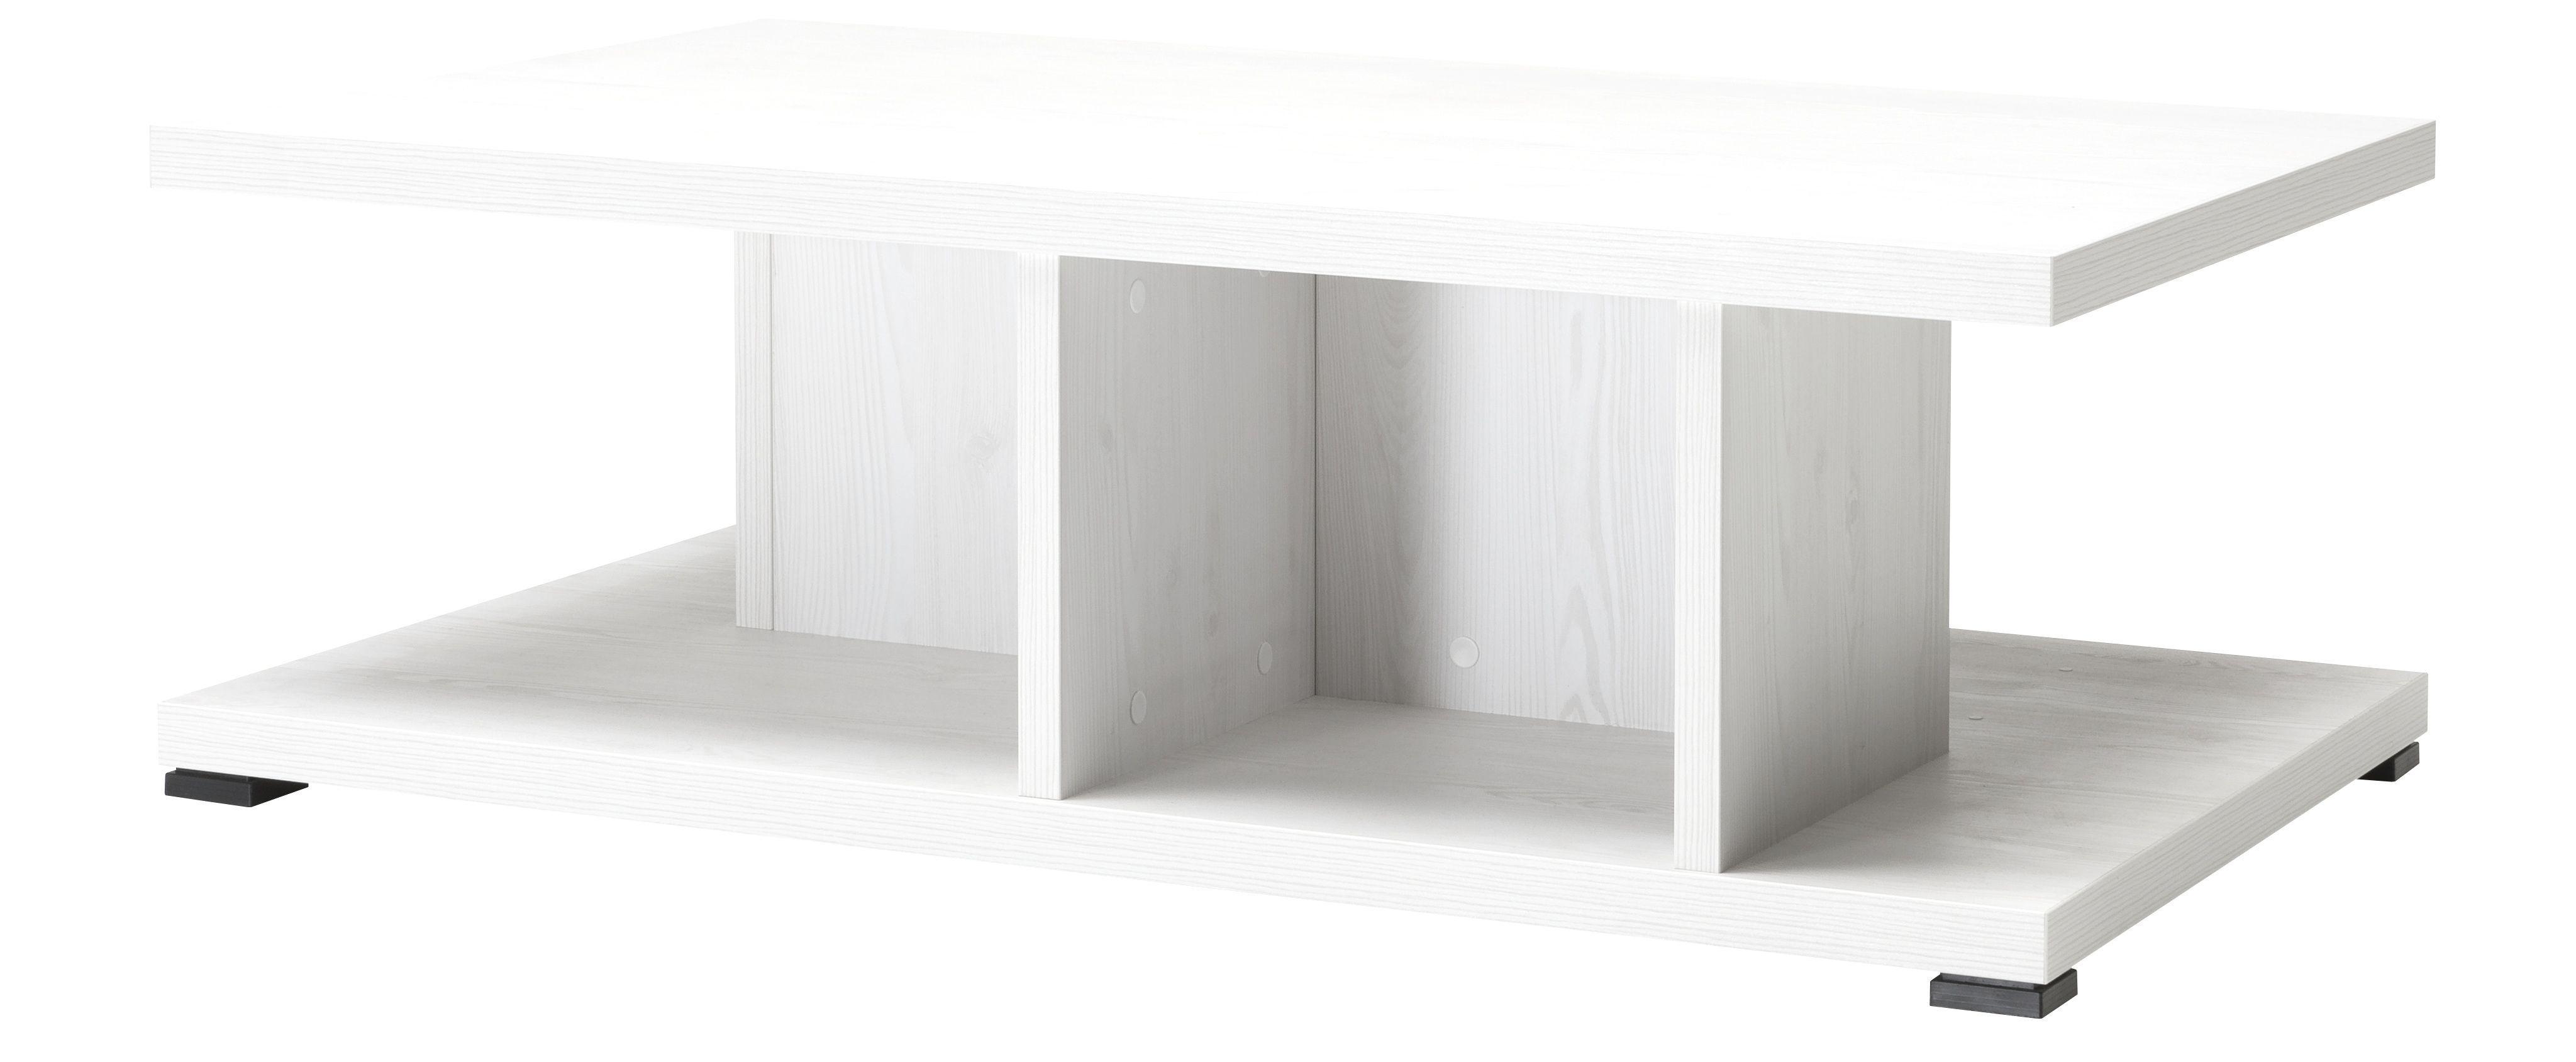 couchtische modern gallery of moderne dekoration genial couchtisch glas oval genial couchtische. Black Bedroom Furniture Sets. Home Design Ideas